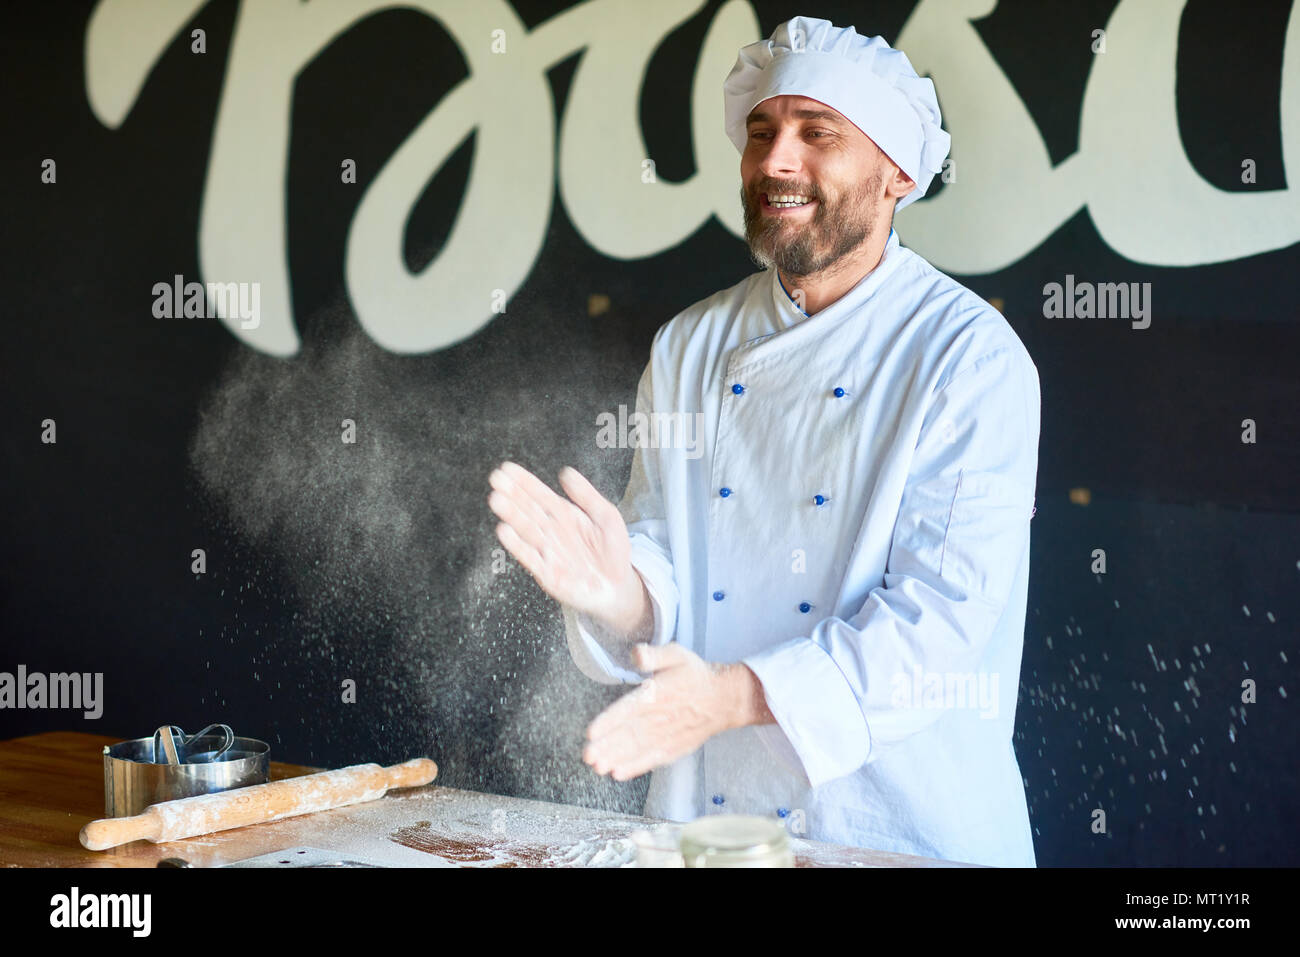 Bäcker in der Küche Stockbild